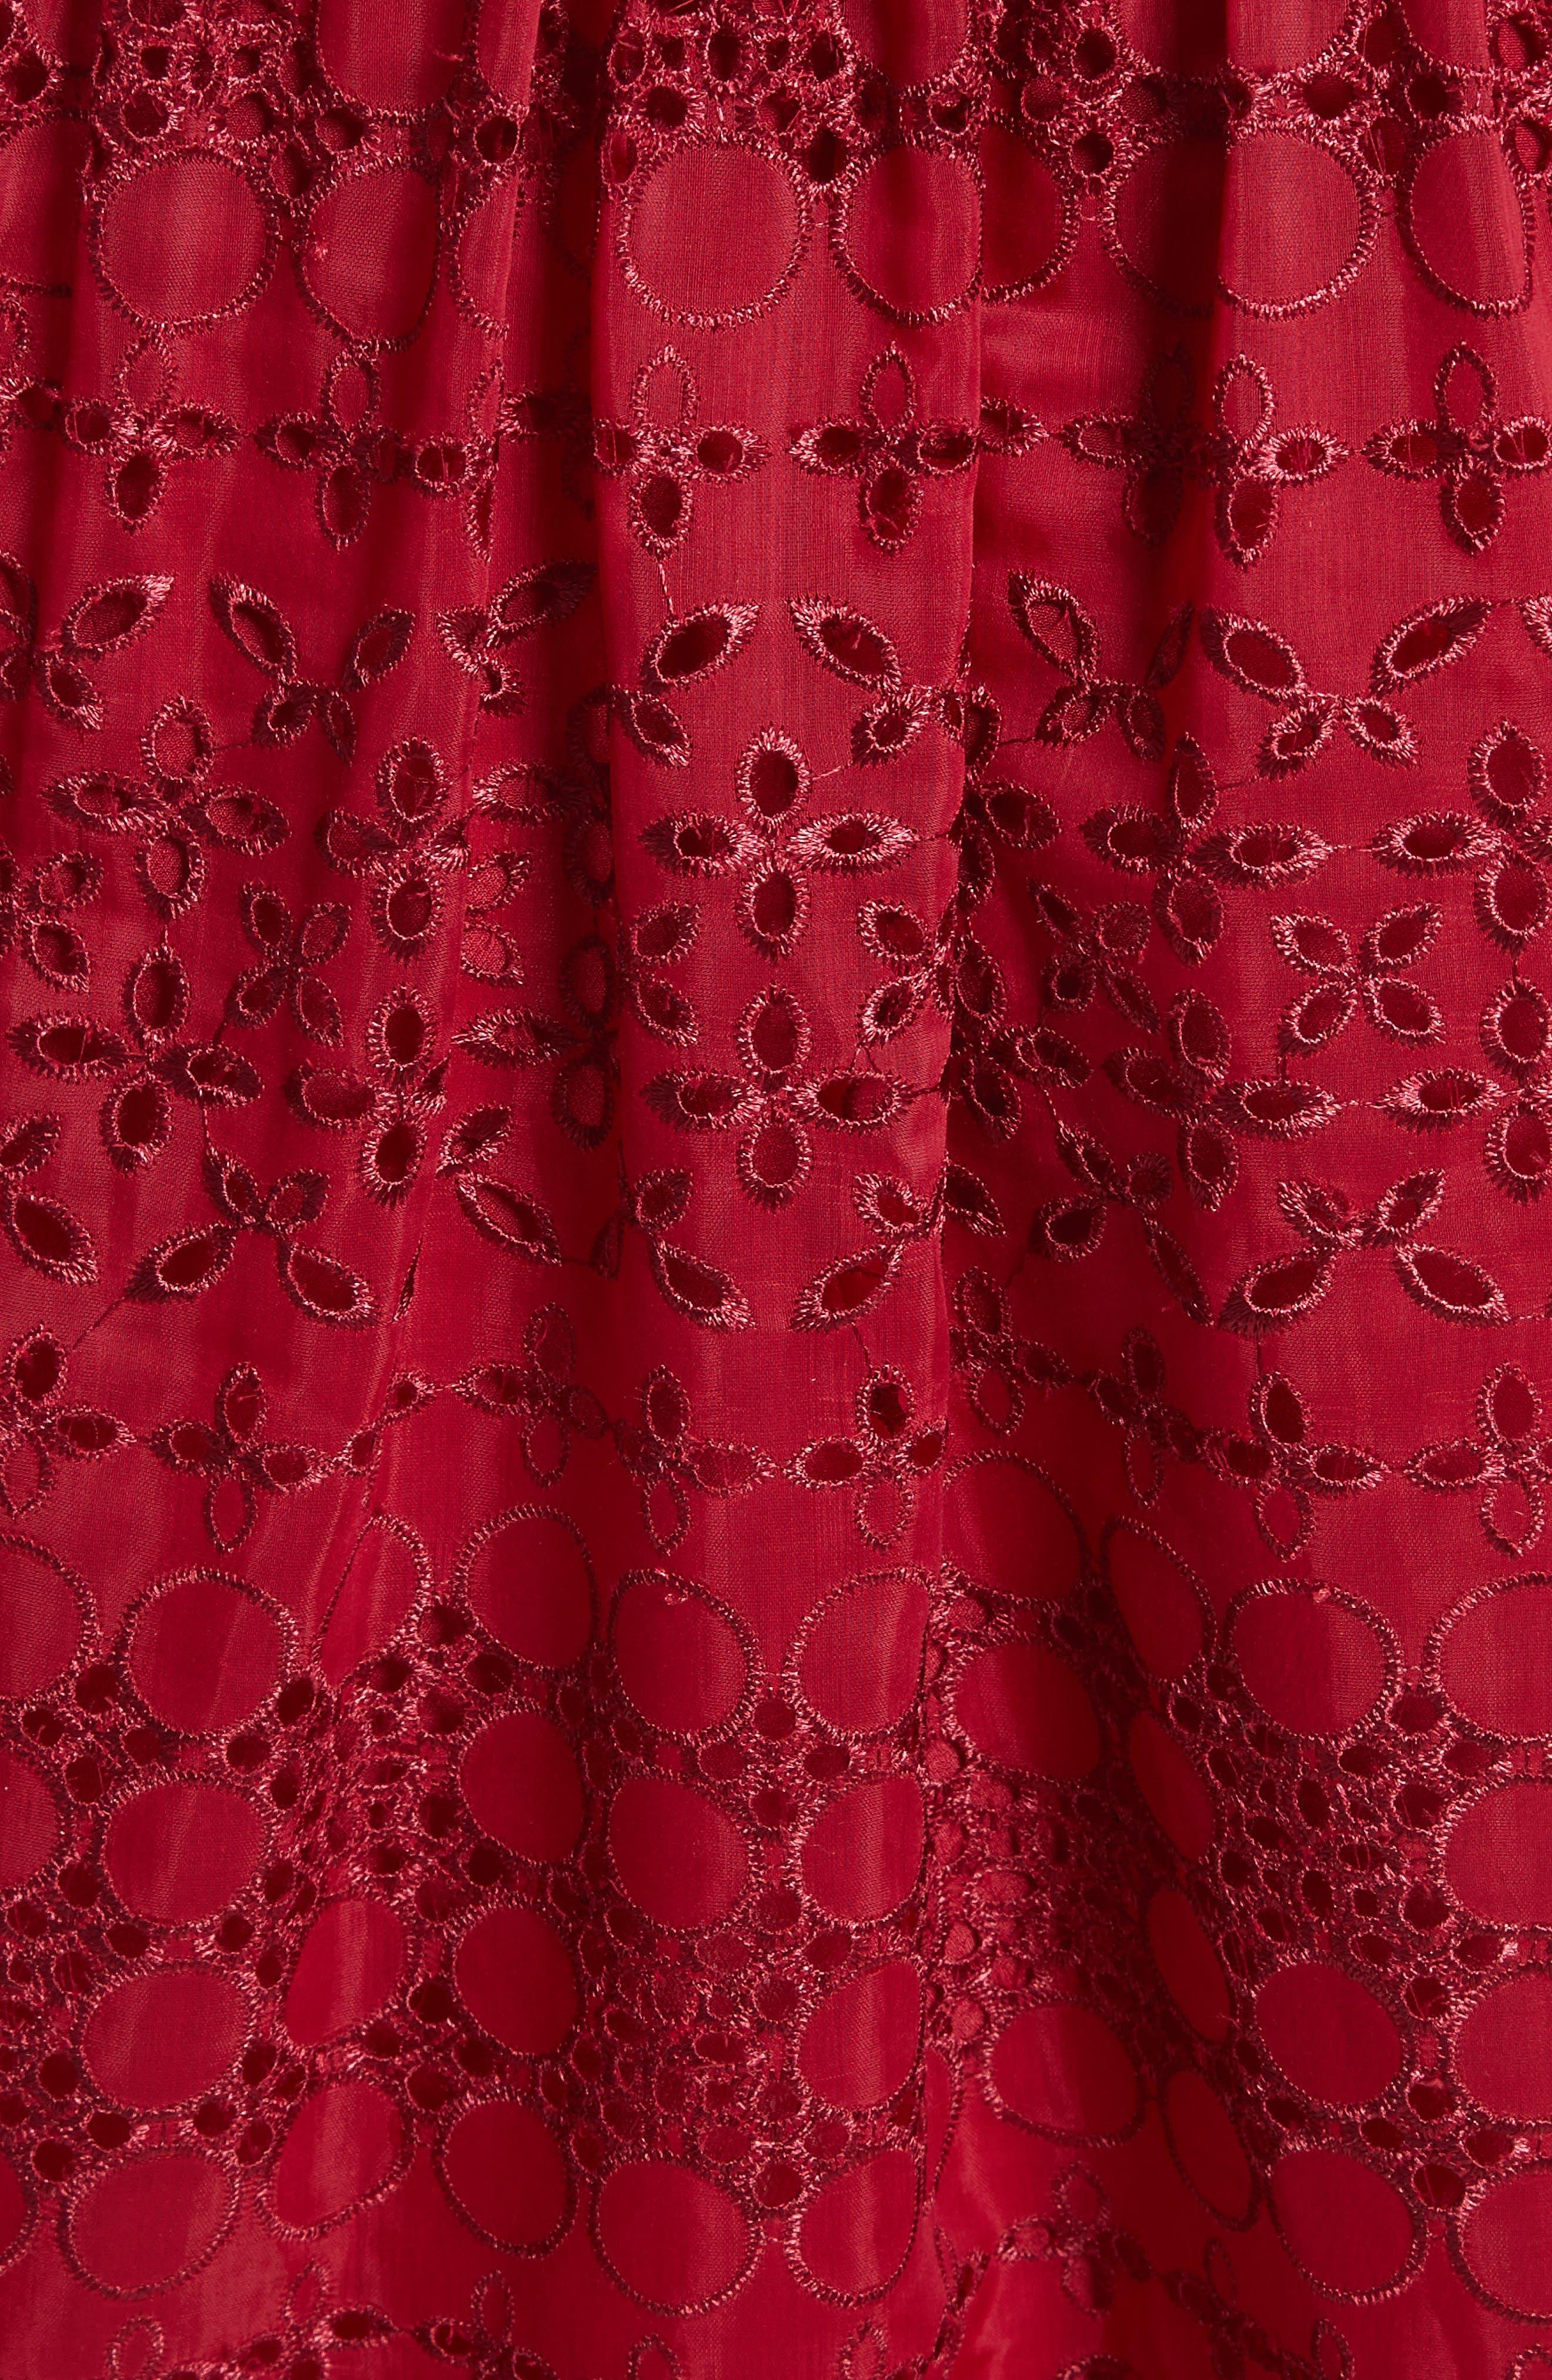 Cutout One-Shoulder Midi Dress,                             Alternate thumbnail 5, color,                             600